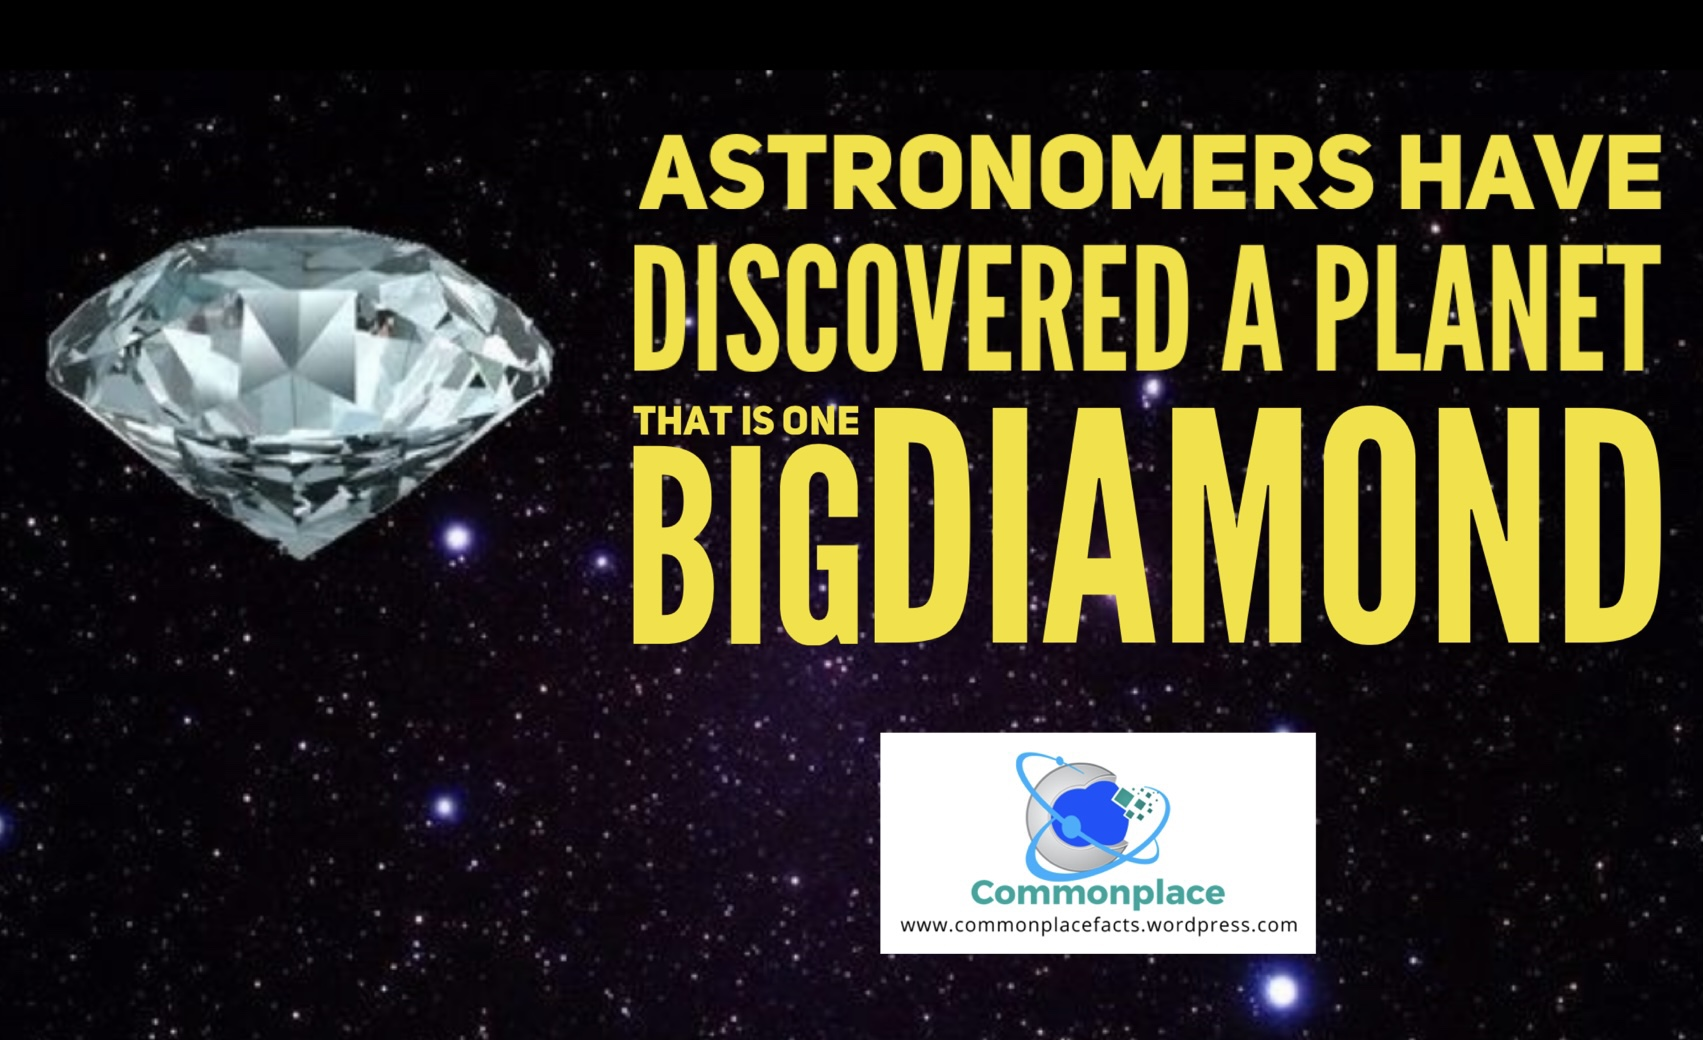 Planet 55 cancri e is one large diamond